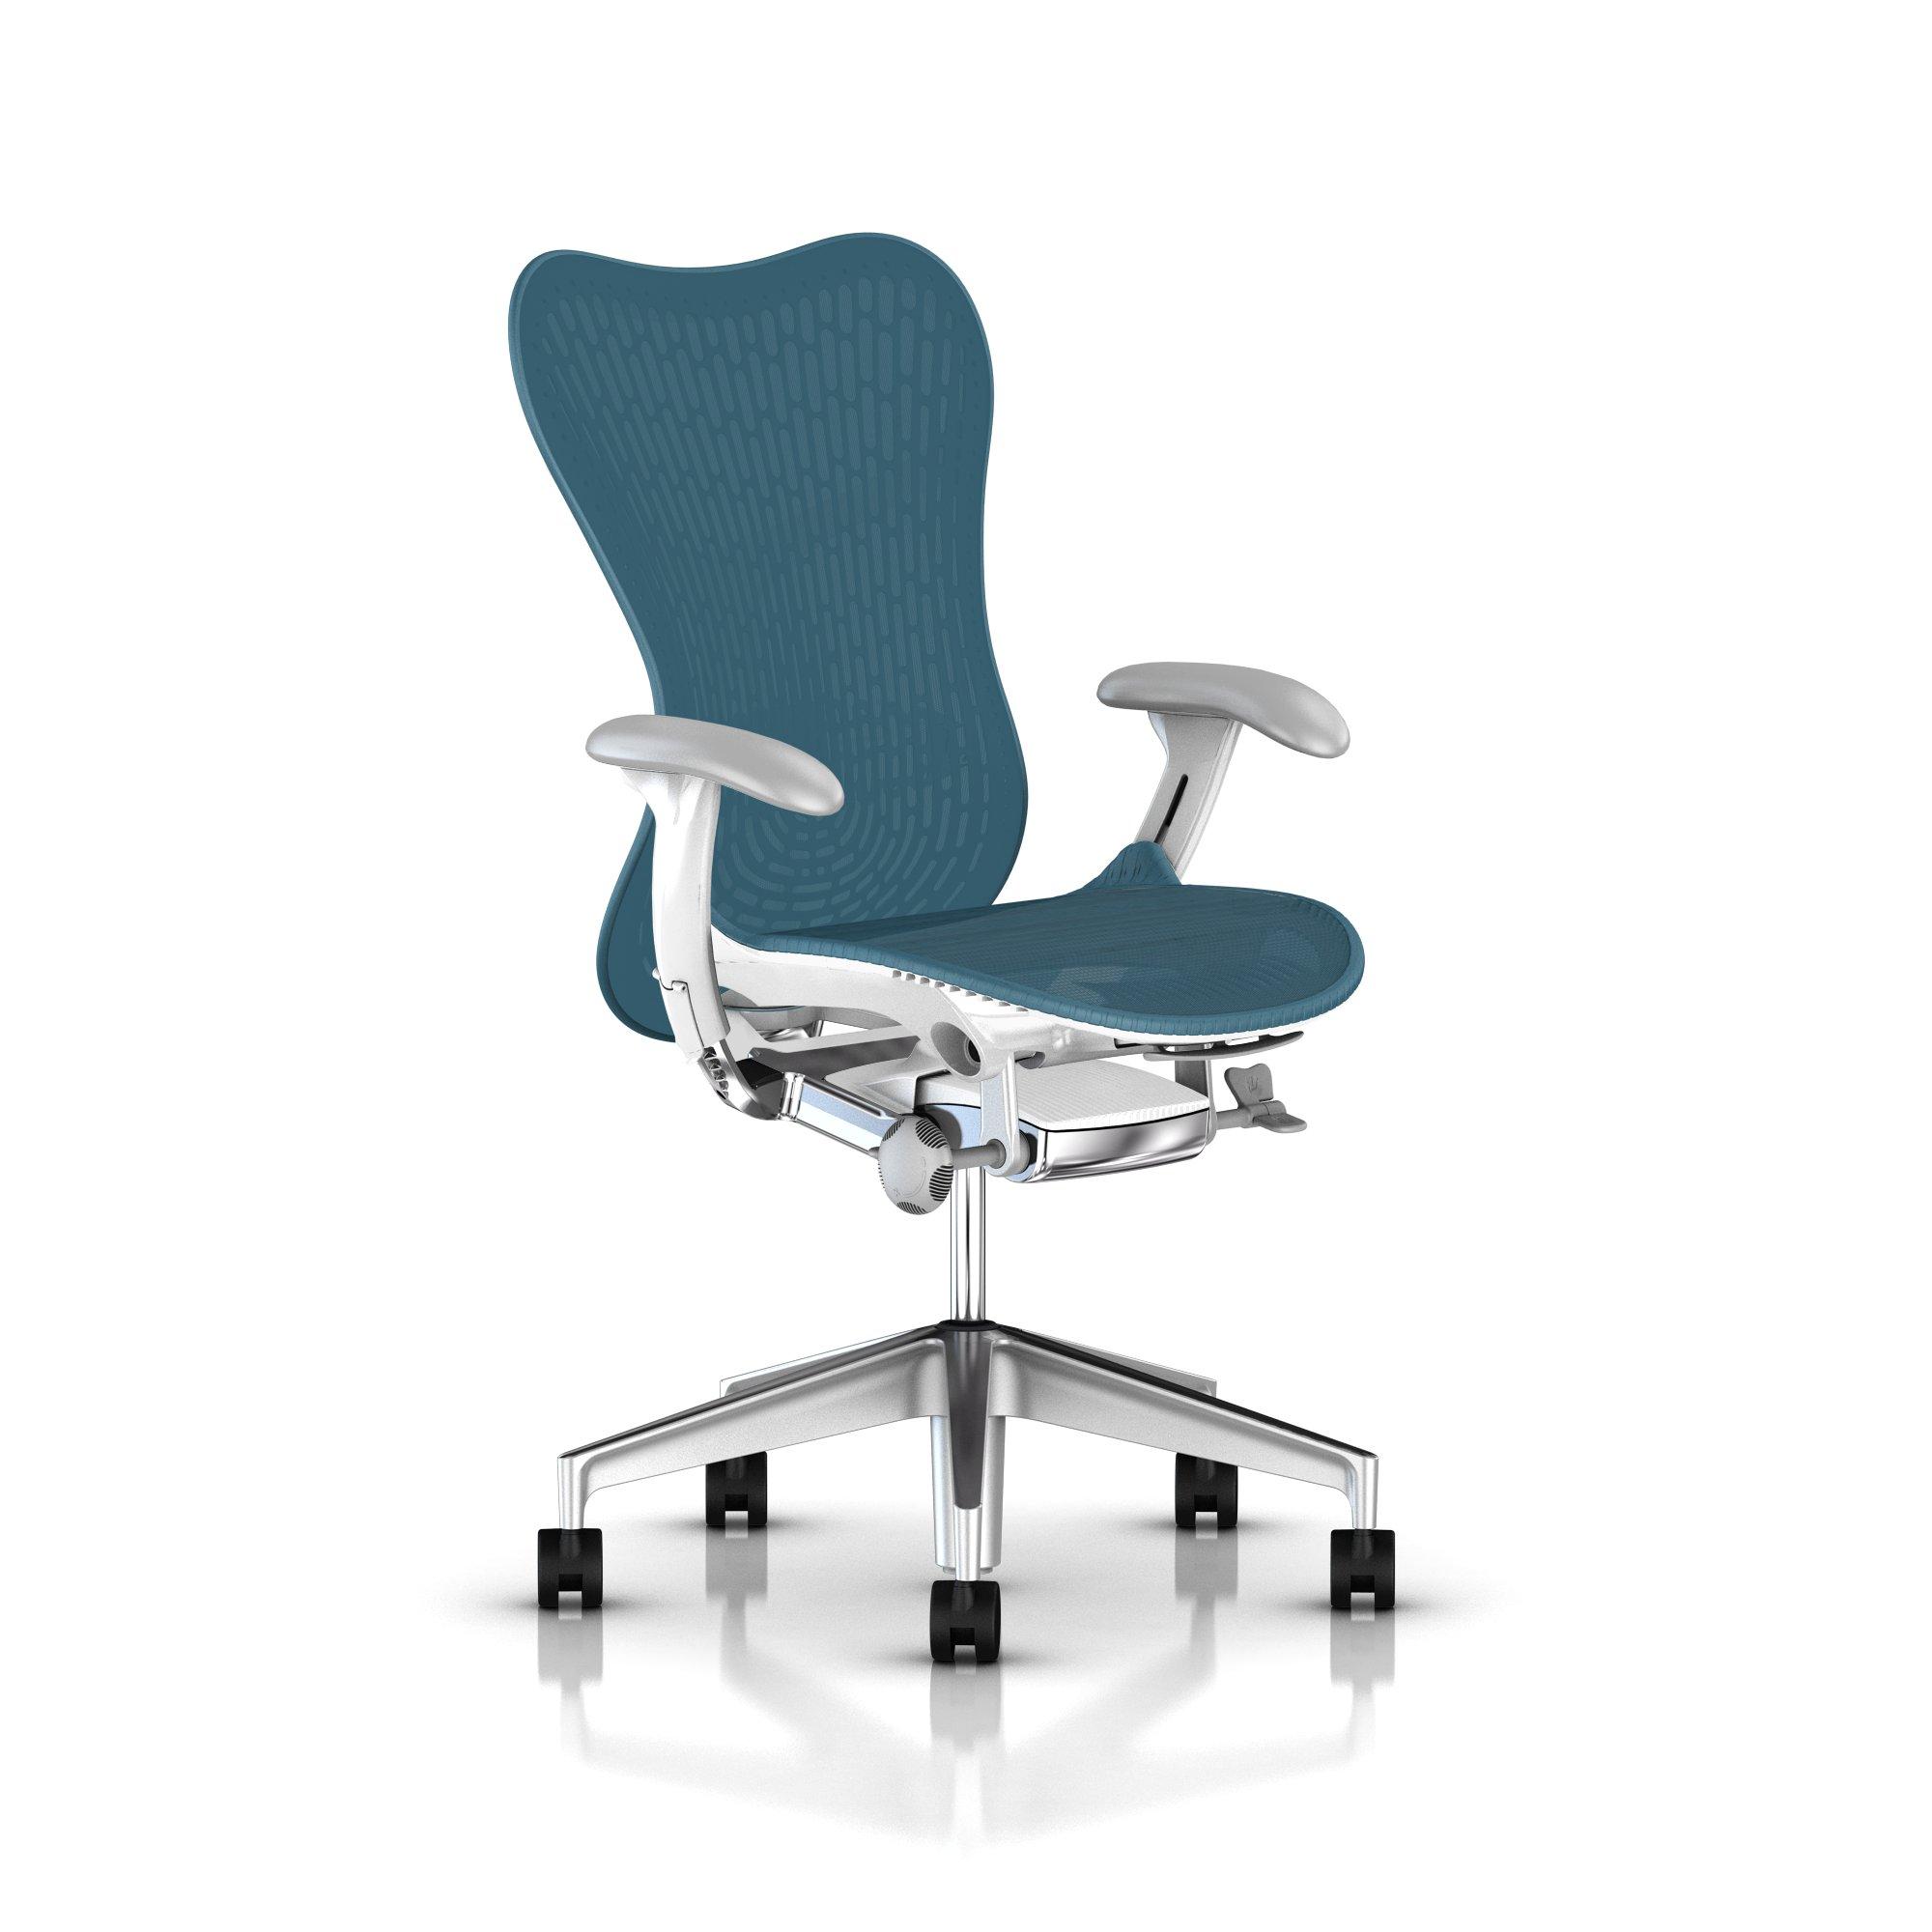 herman miller mirra 2 chair executive turquoise gr. Black Bedroom Furniture Sets. Home Design Ideas